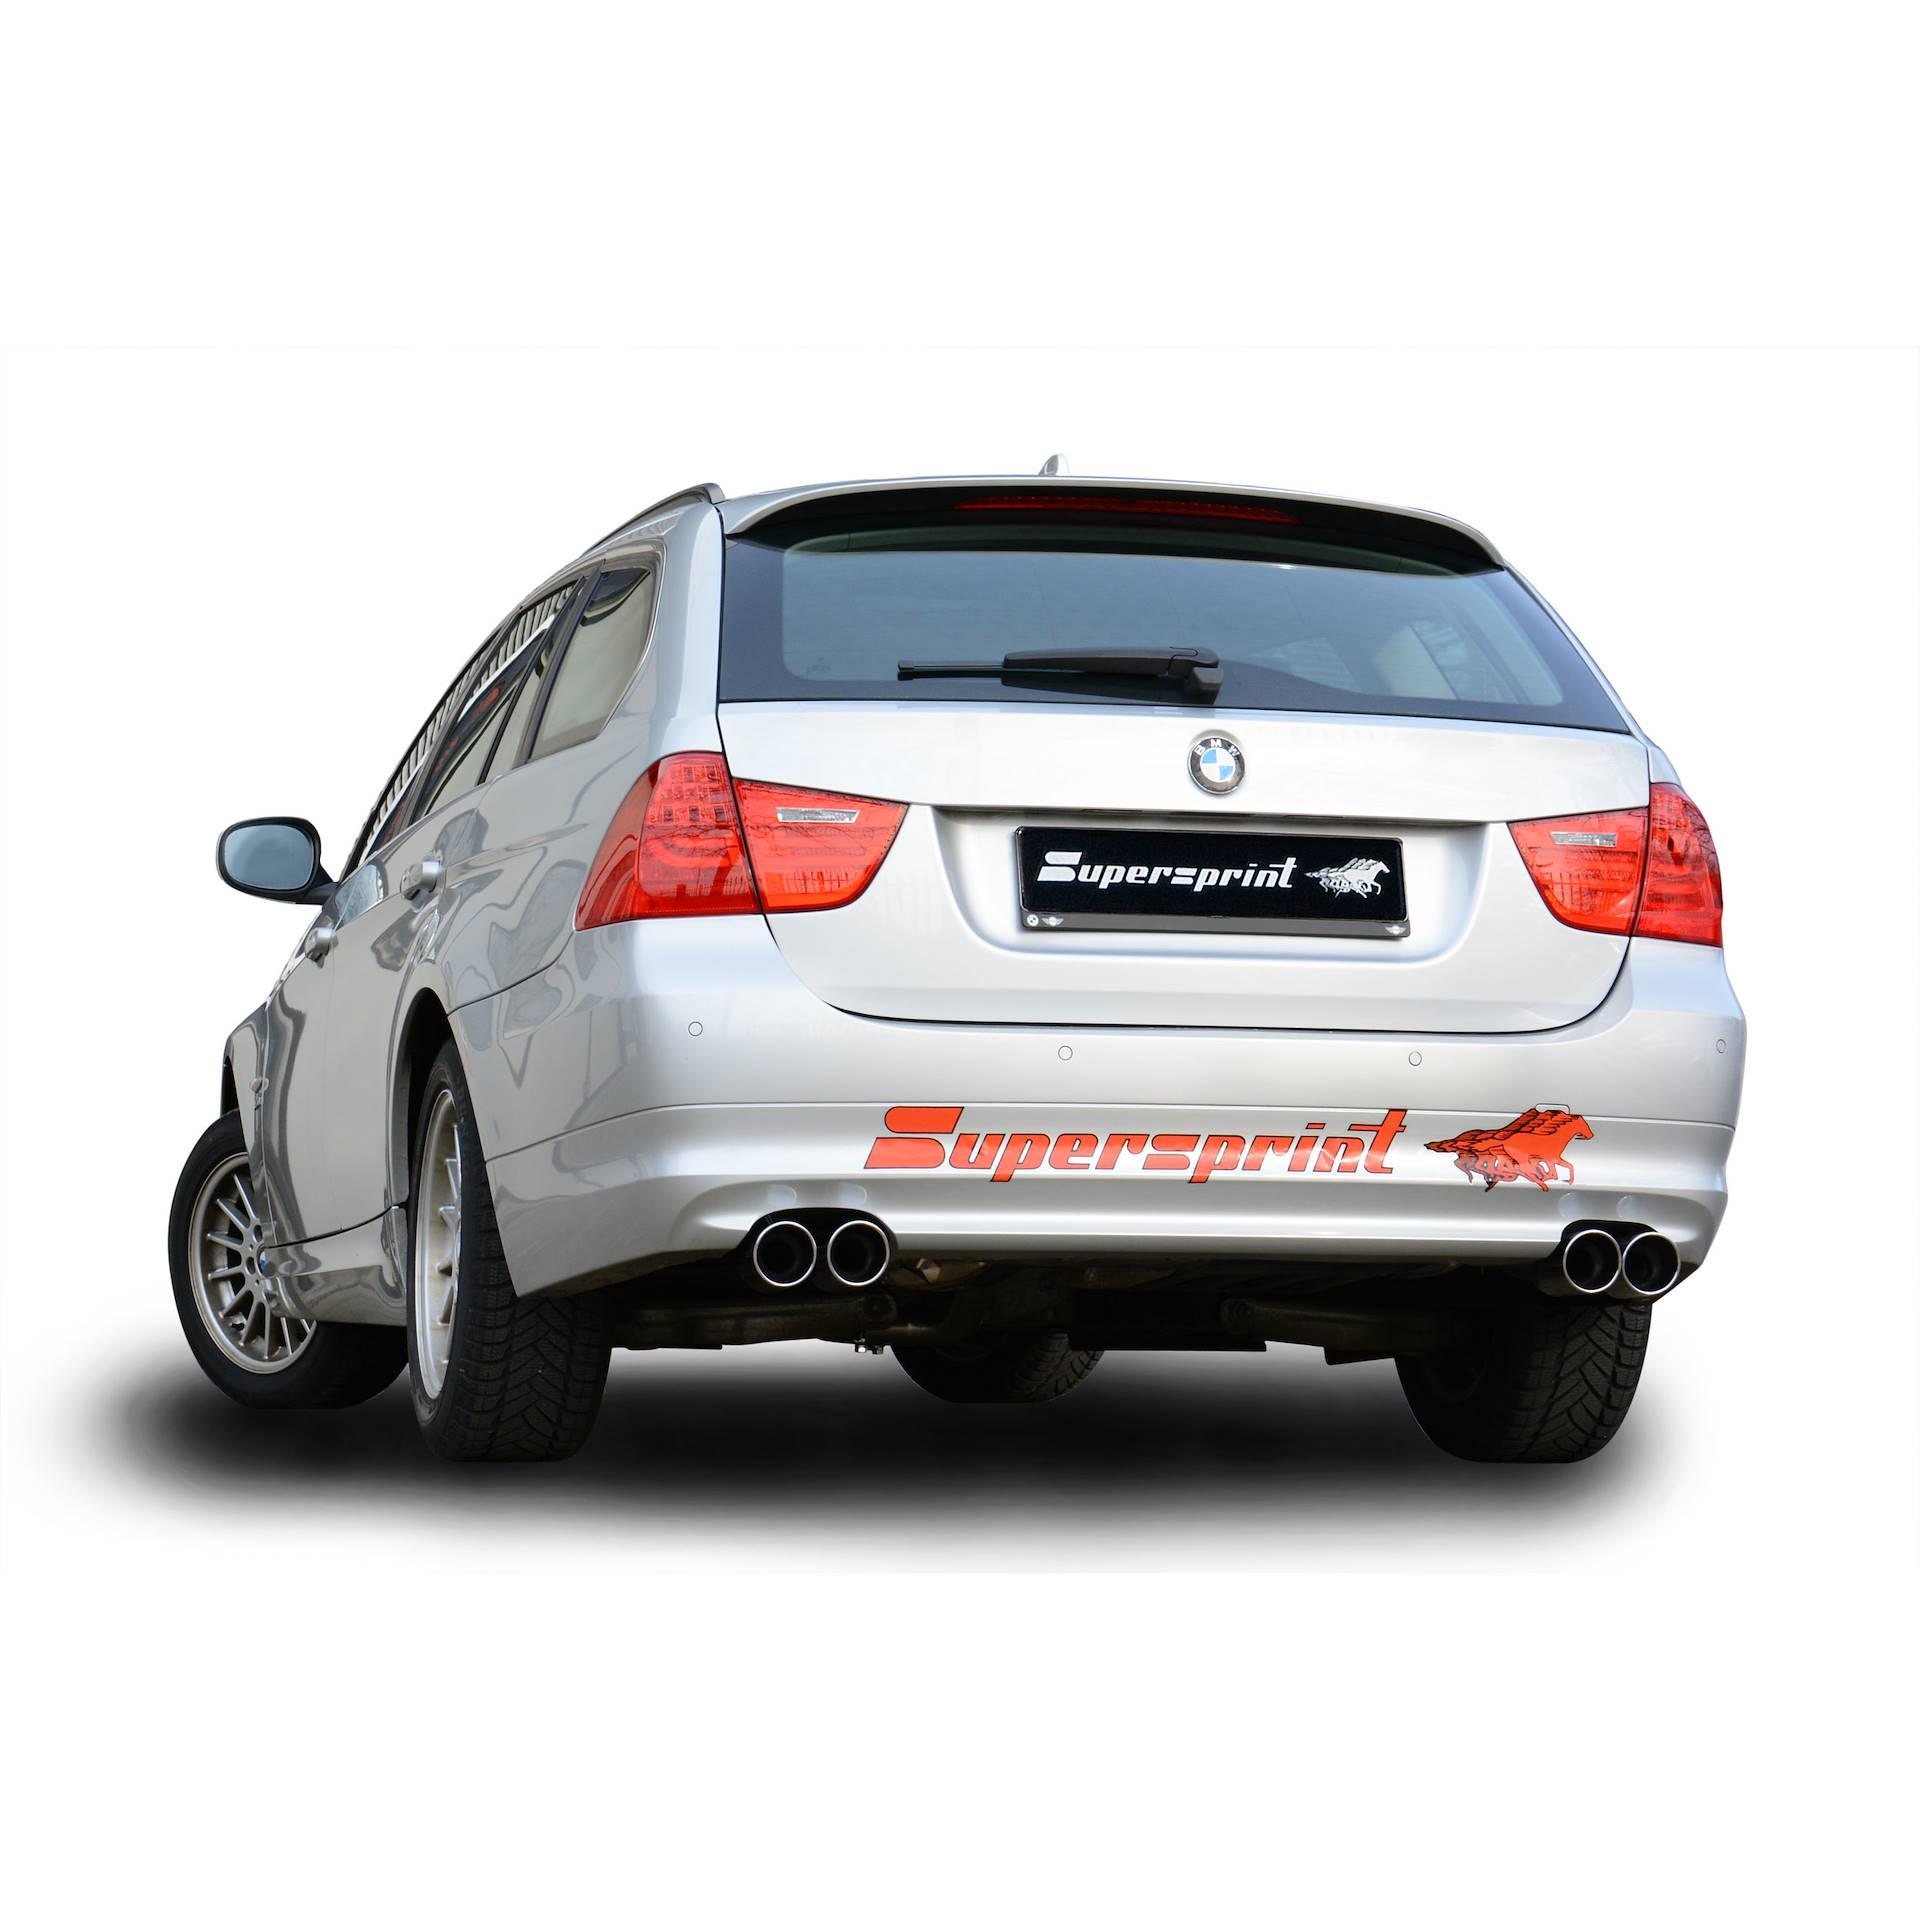 2008 Bmw 335xi Price: Performance Sport Exhaust For BMW E91 Touring 325i / 325xi